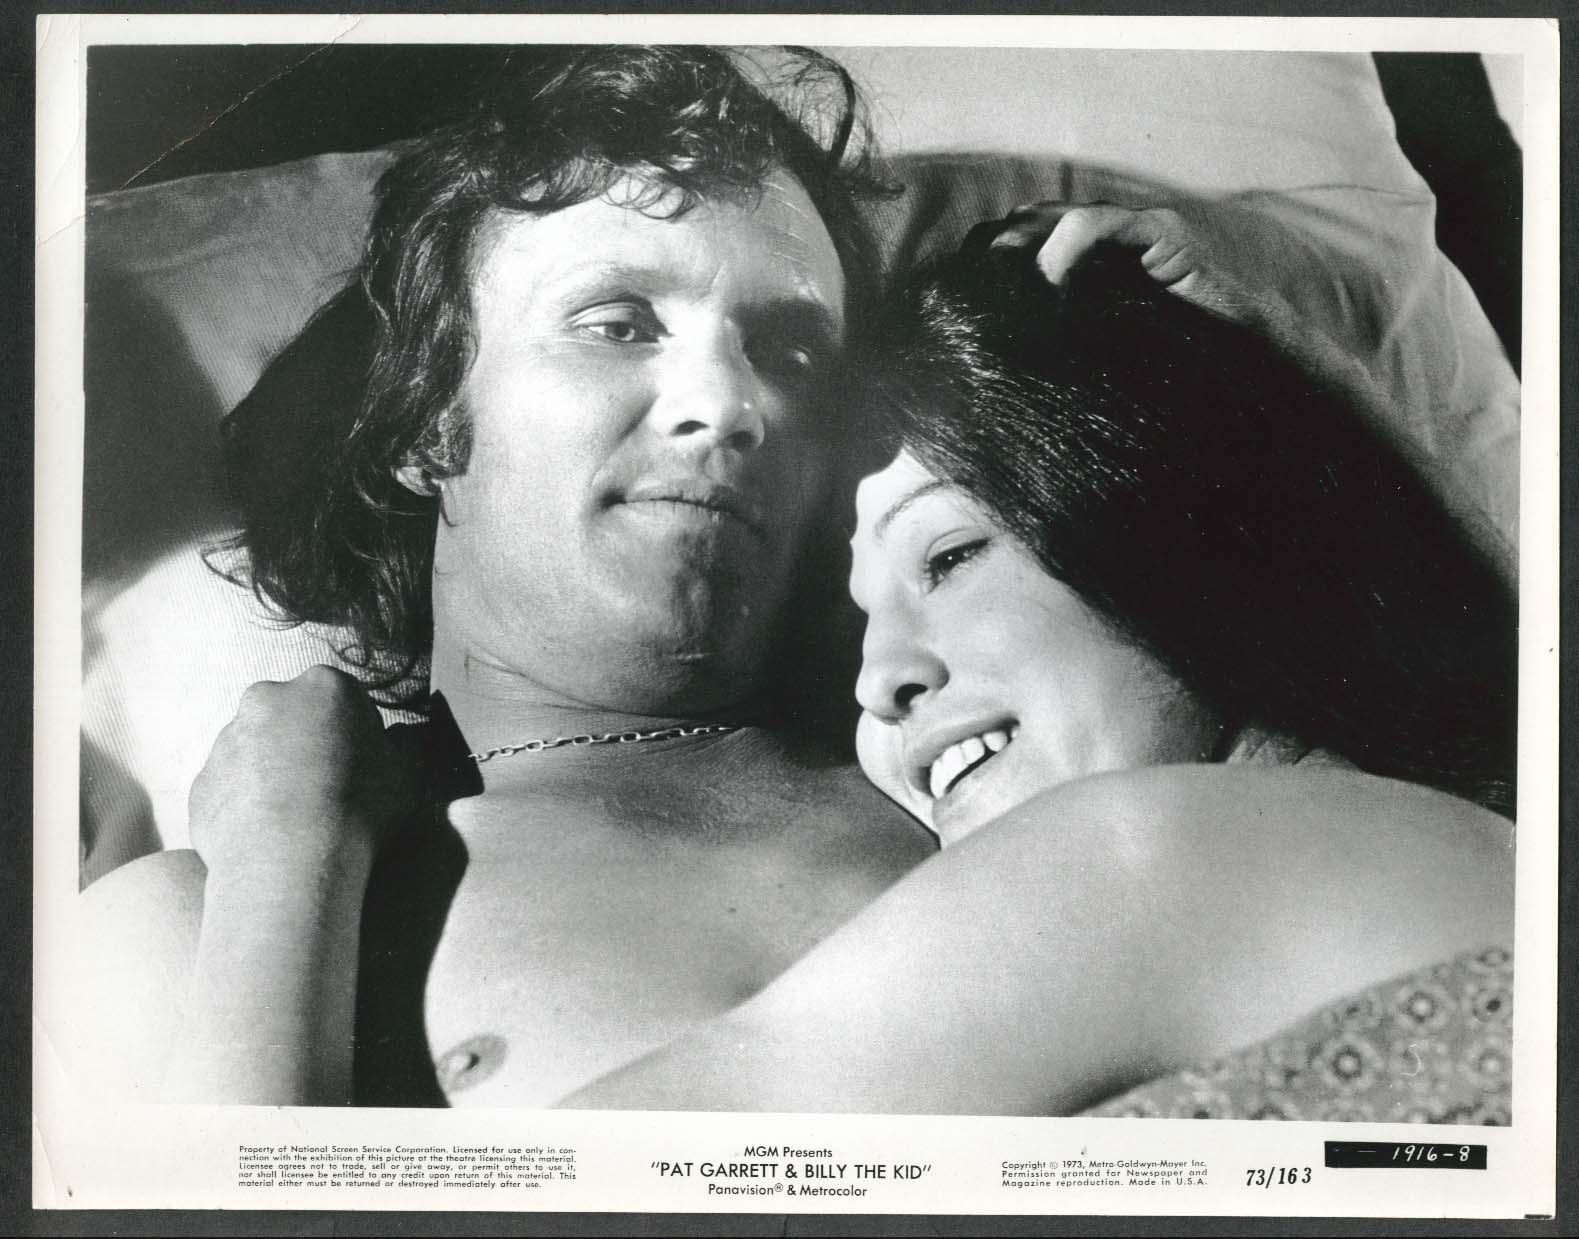 Image for Kris Kristofferson Rita Coolidge Pat Garrett & Billy the Kid 8x10 photo 1973